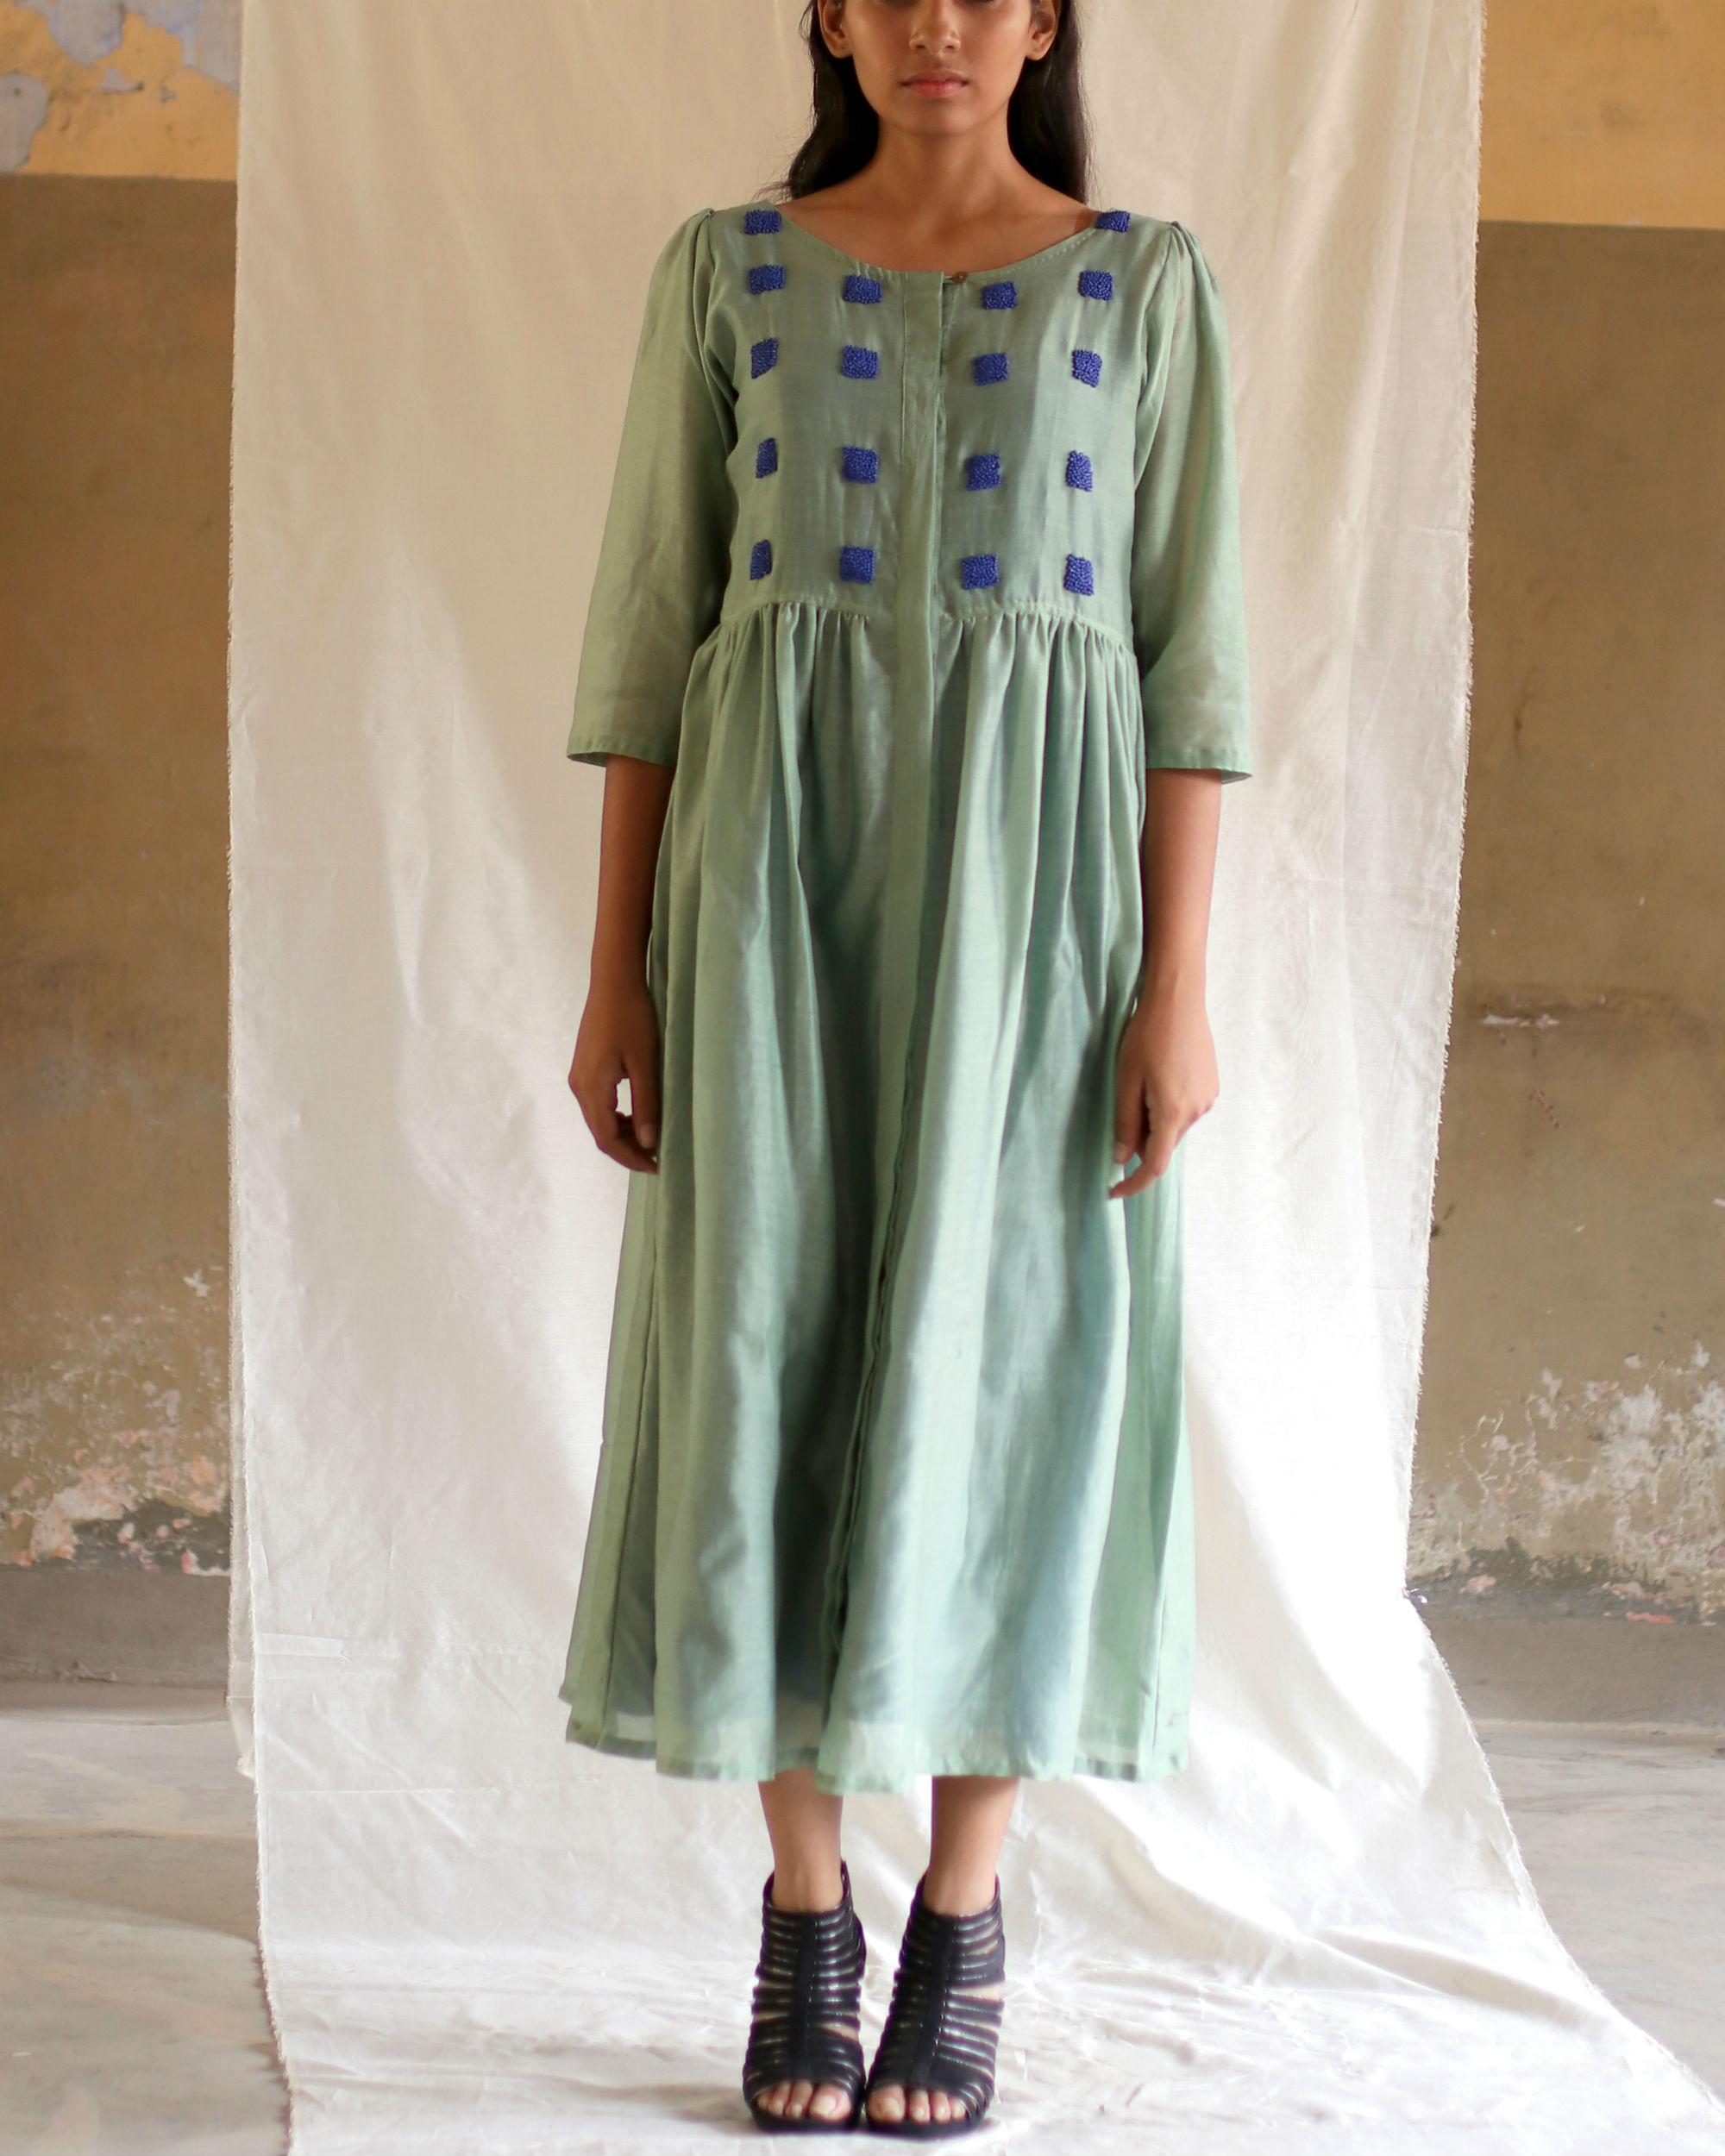 Mint green bead dress with blue slip